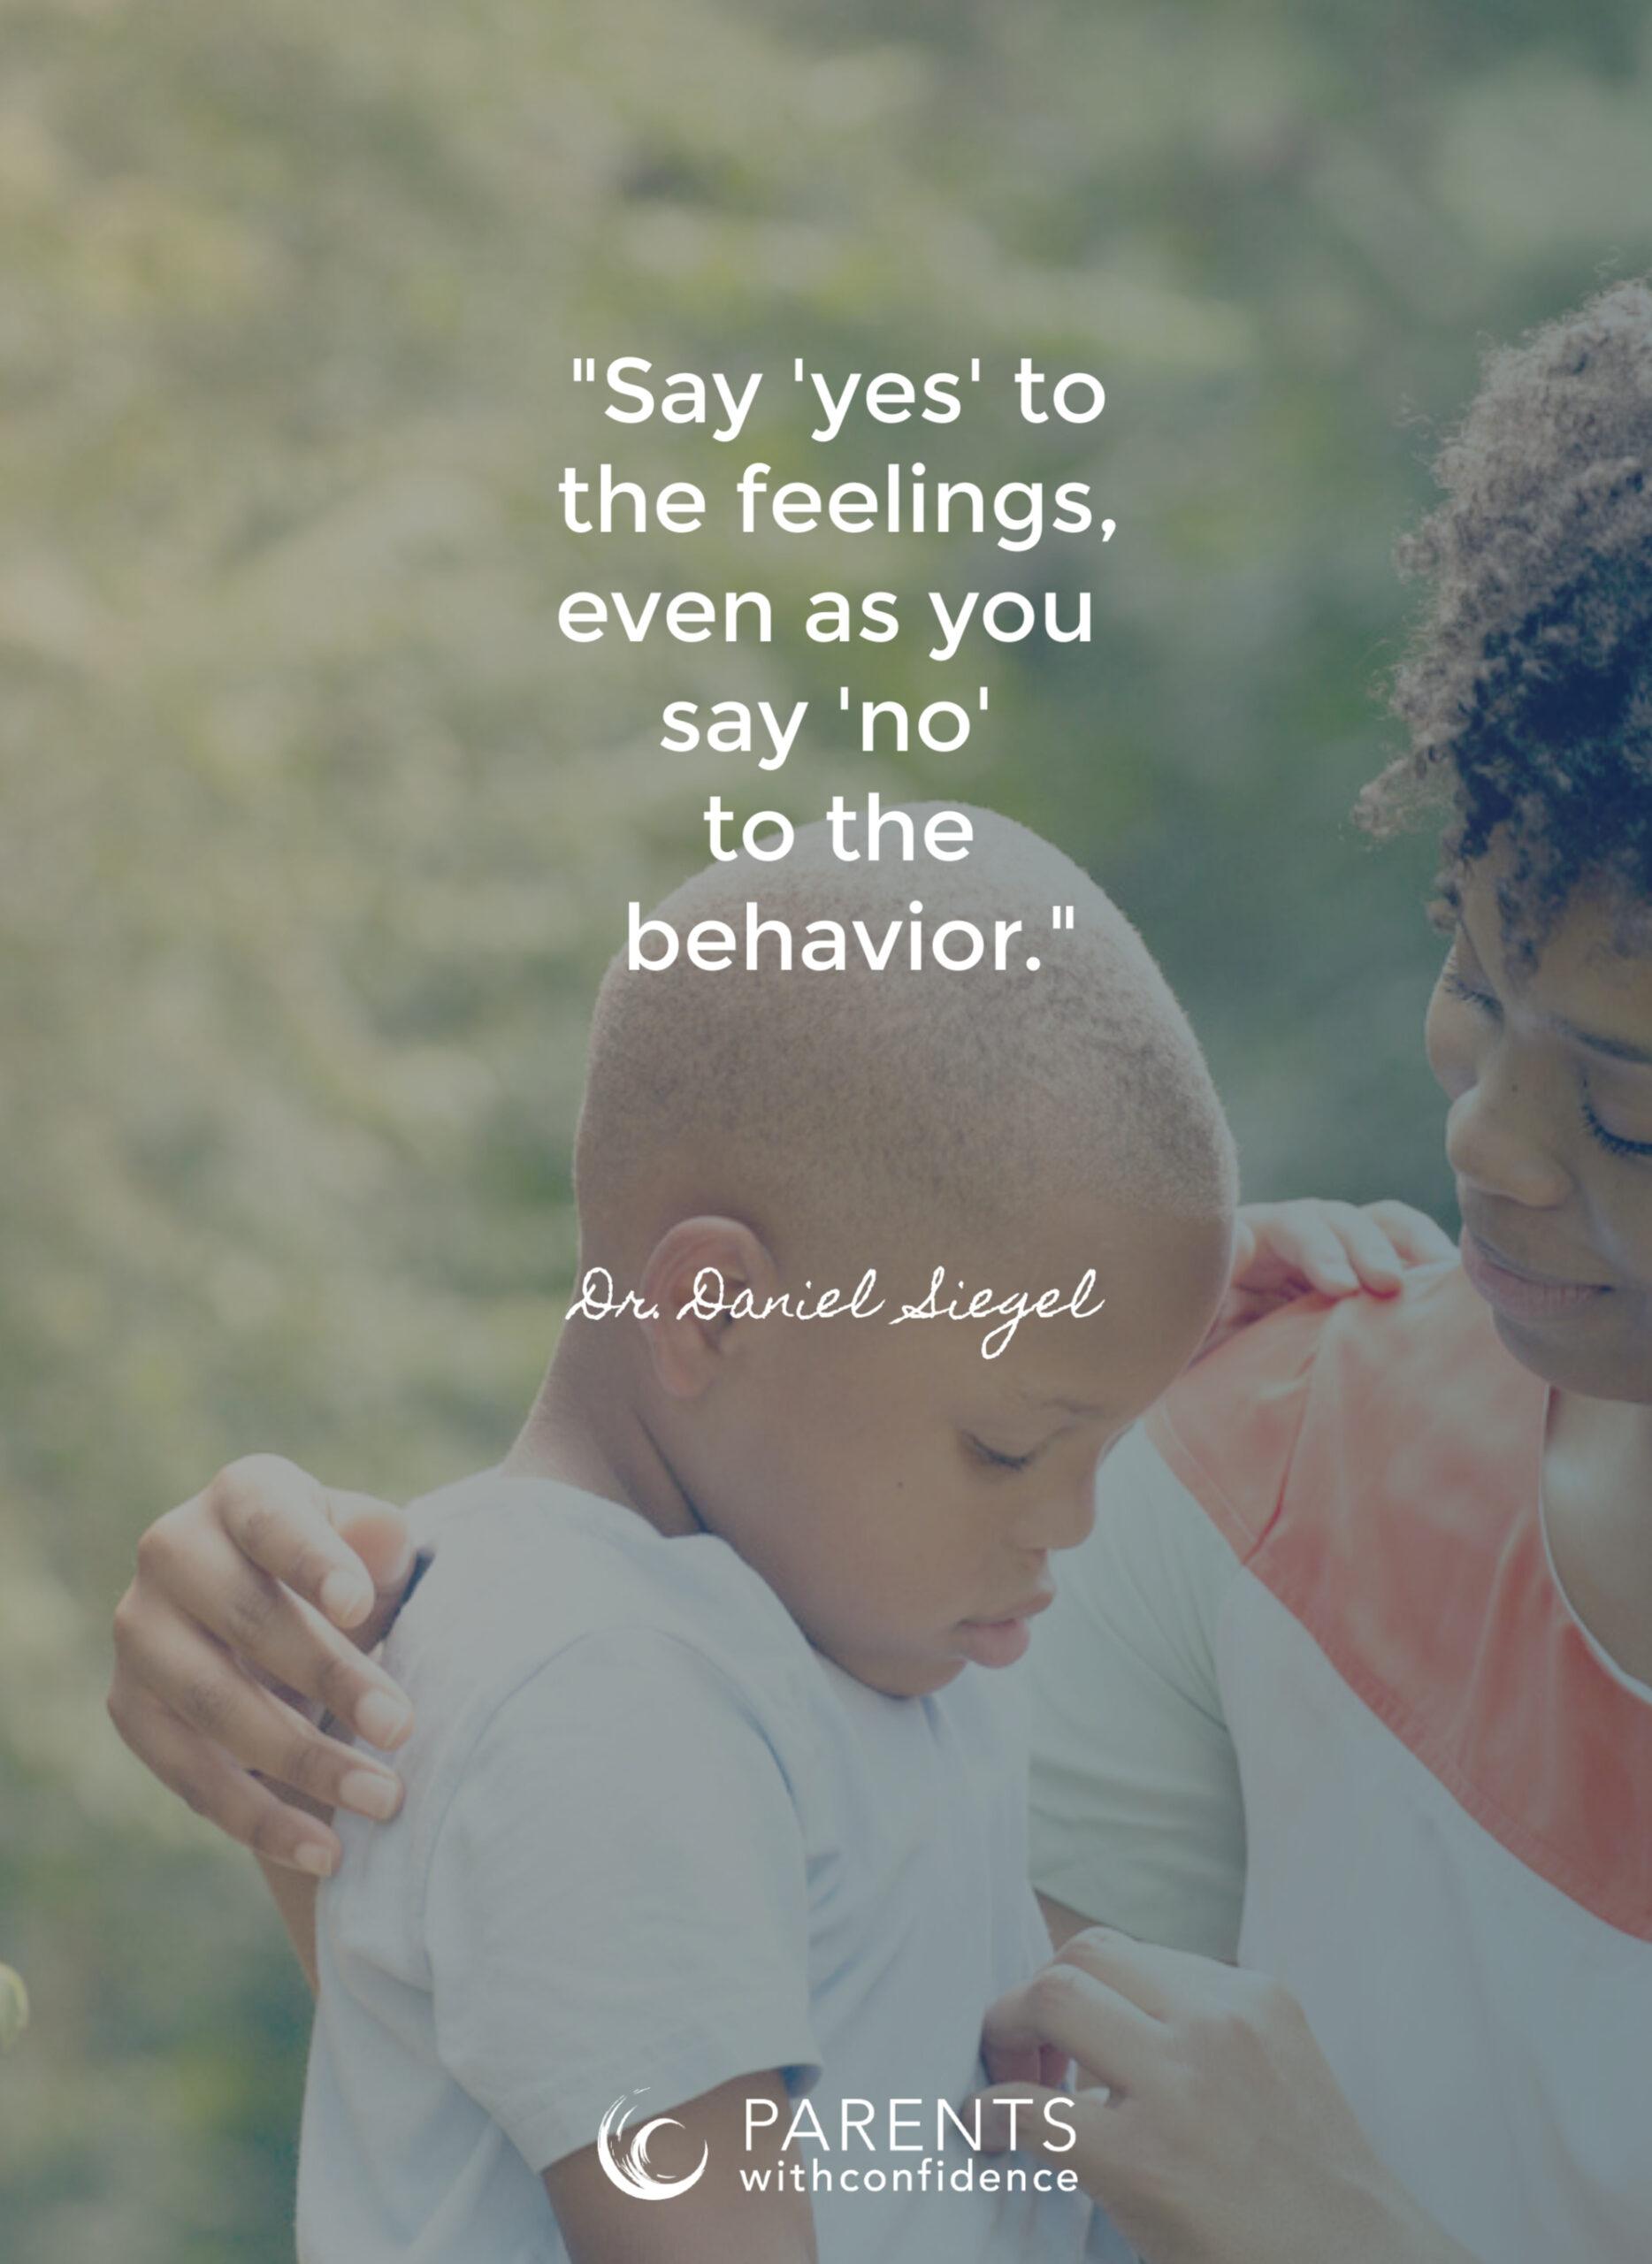 handle child's emotional outburst